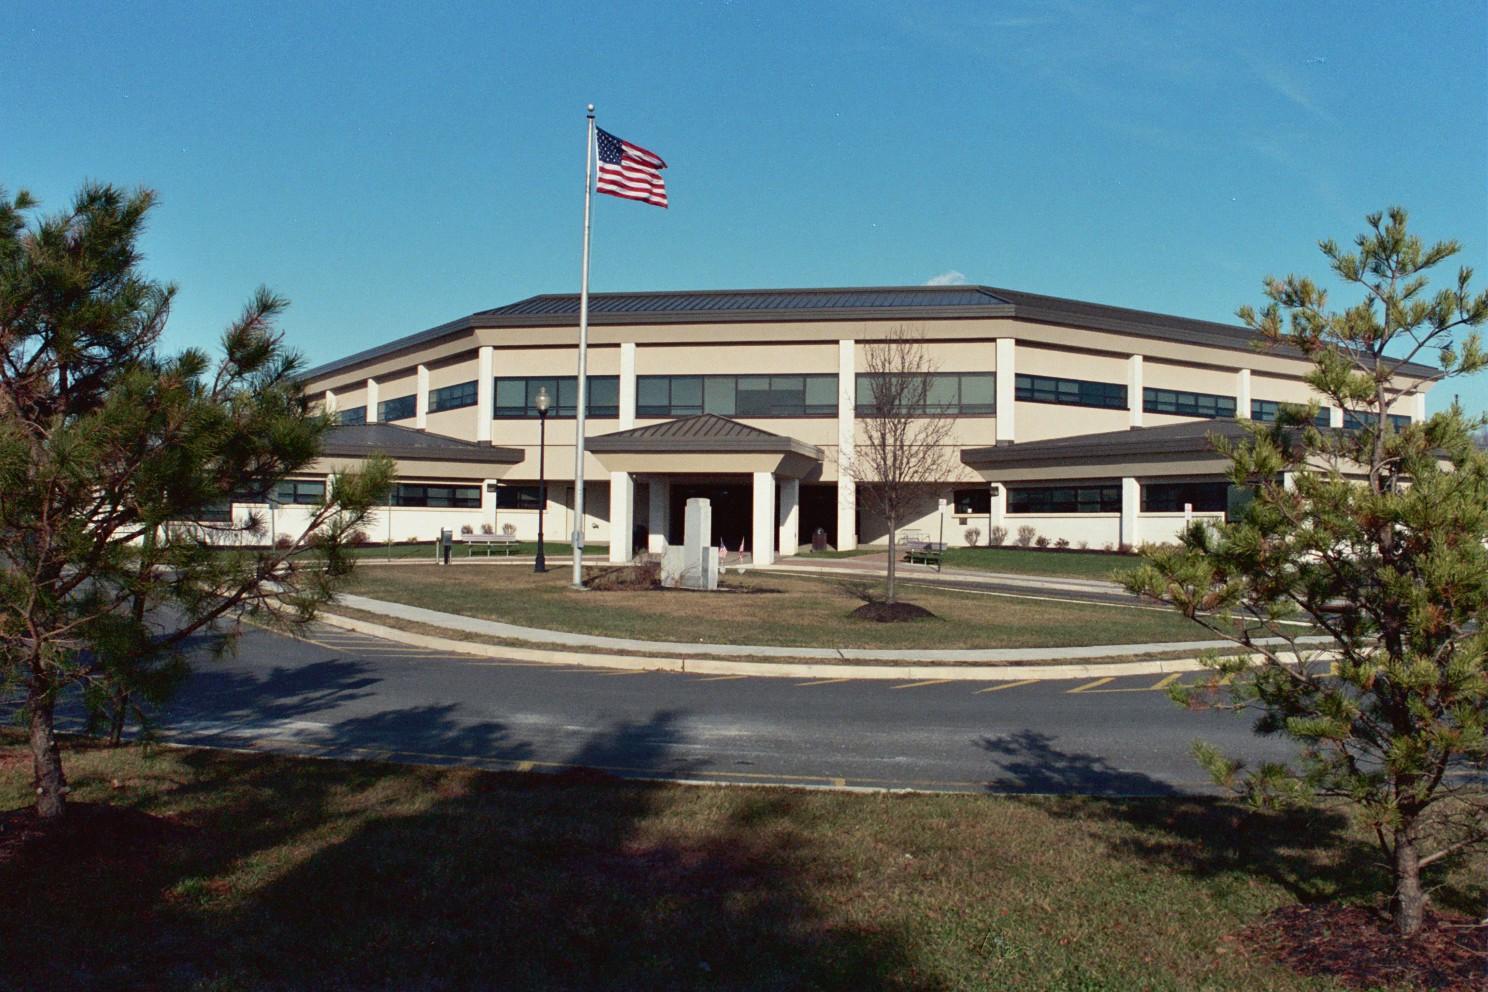 Evesham Twp. Municipal Facility